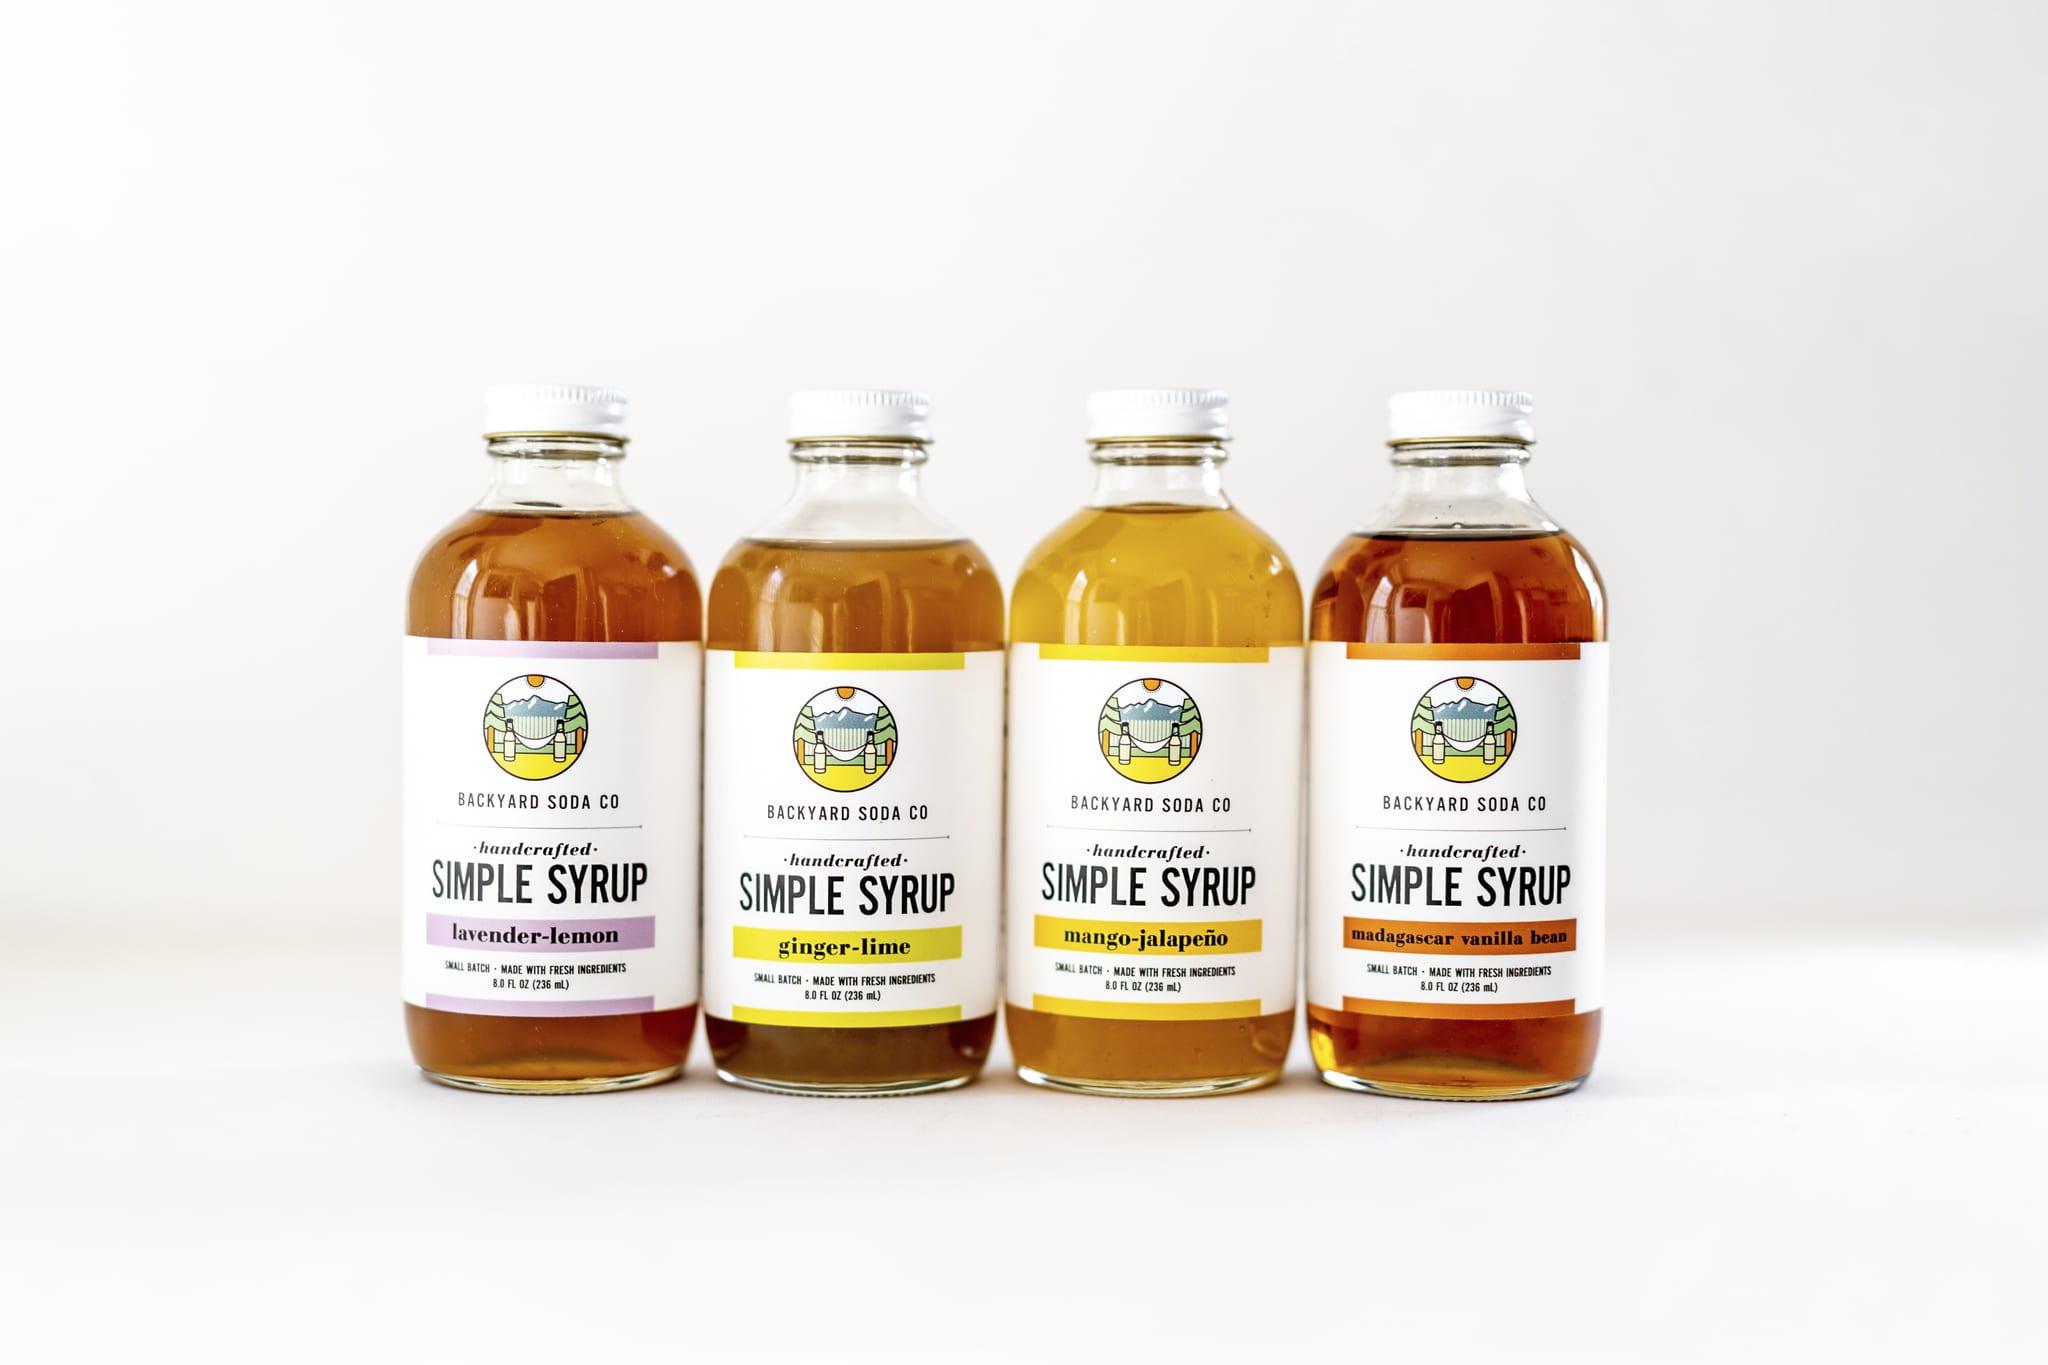 Simple Syrup by Backyard Soda Co